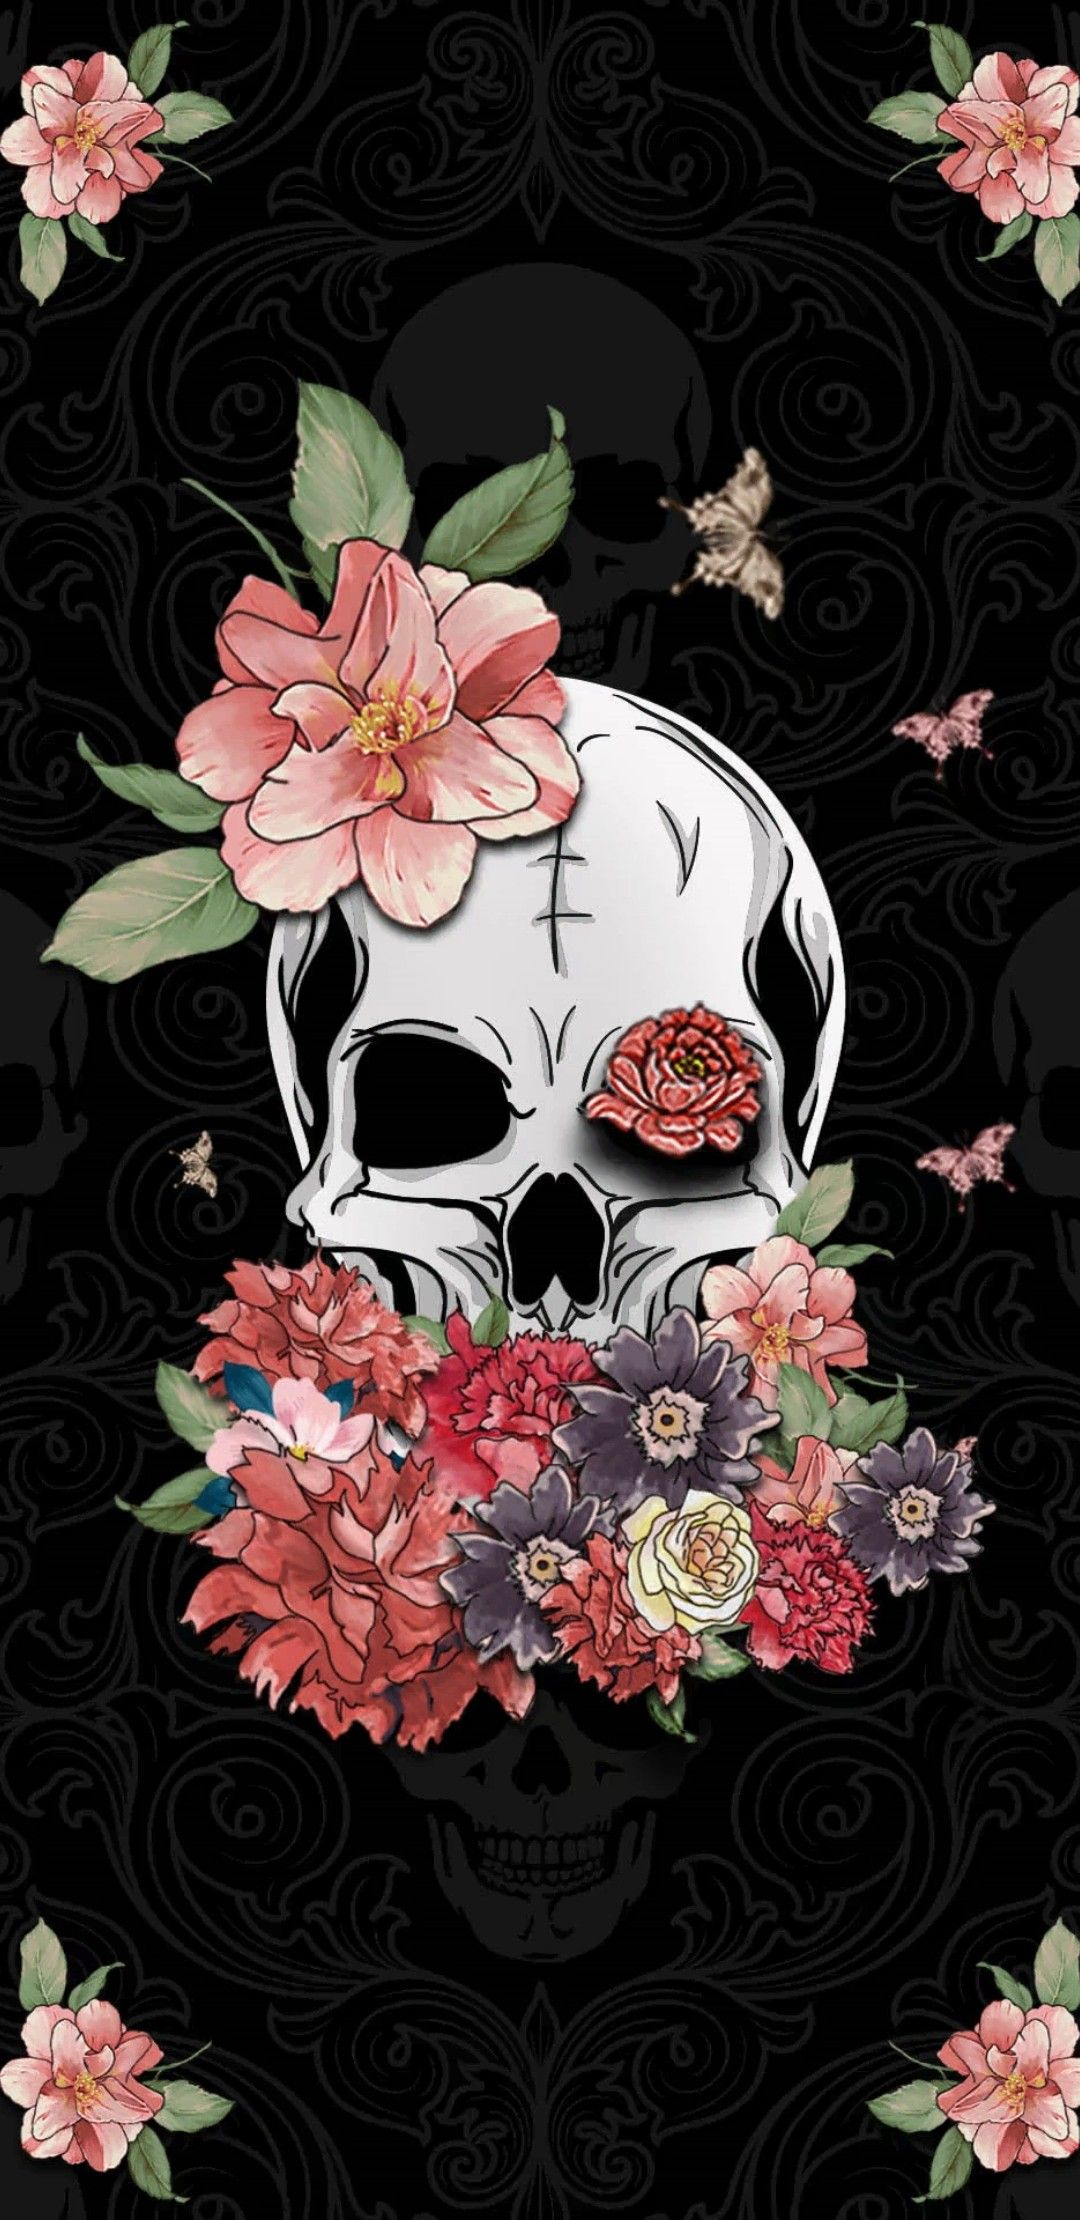 Pin By Buddy Milligan On Skull Skeleton Wallpaper Skull Wallpaper Skull Art Skull Artwork